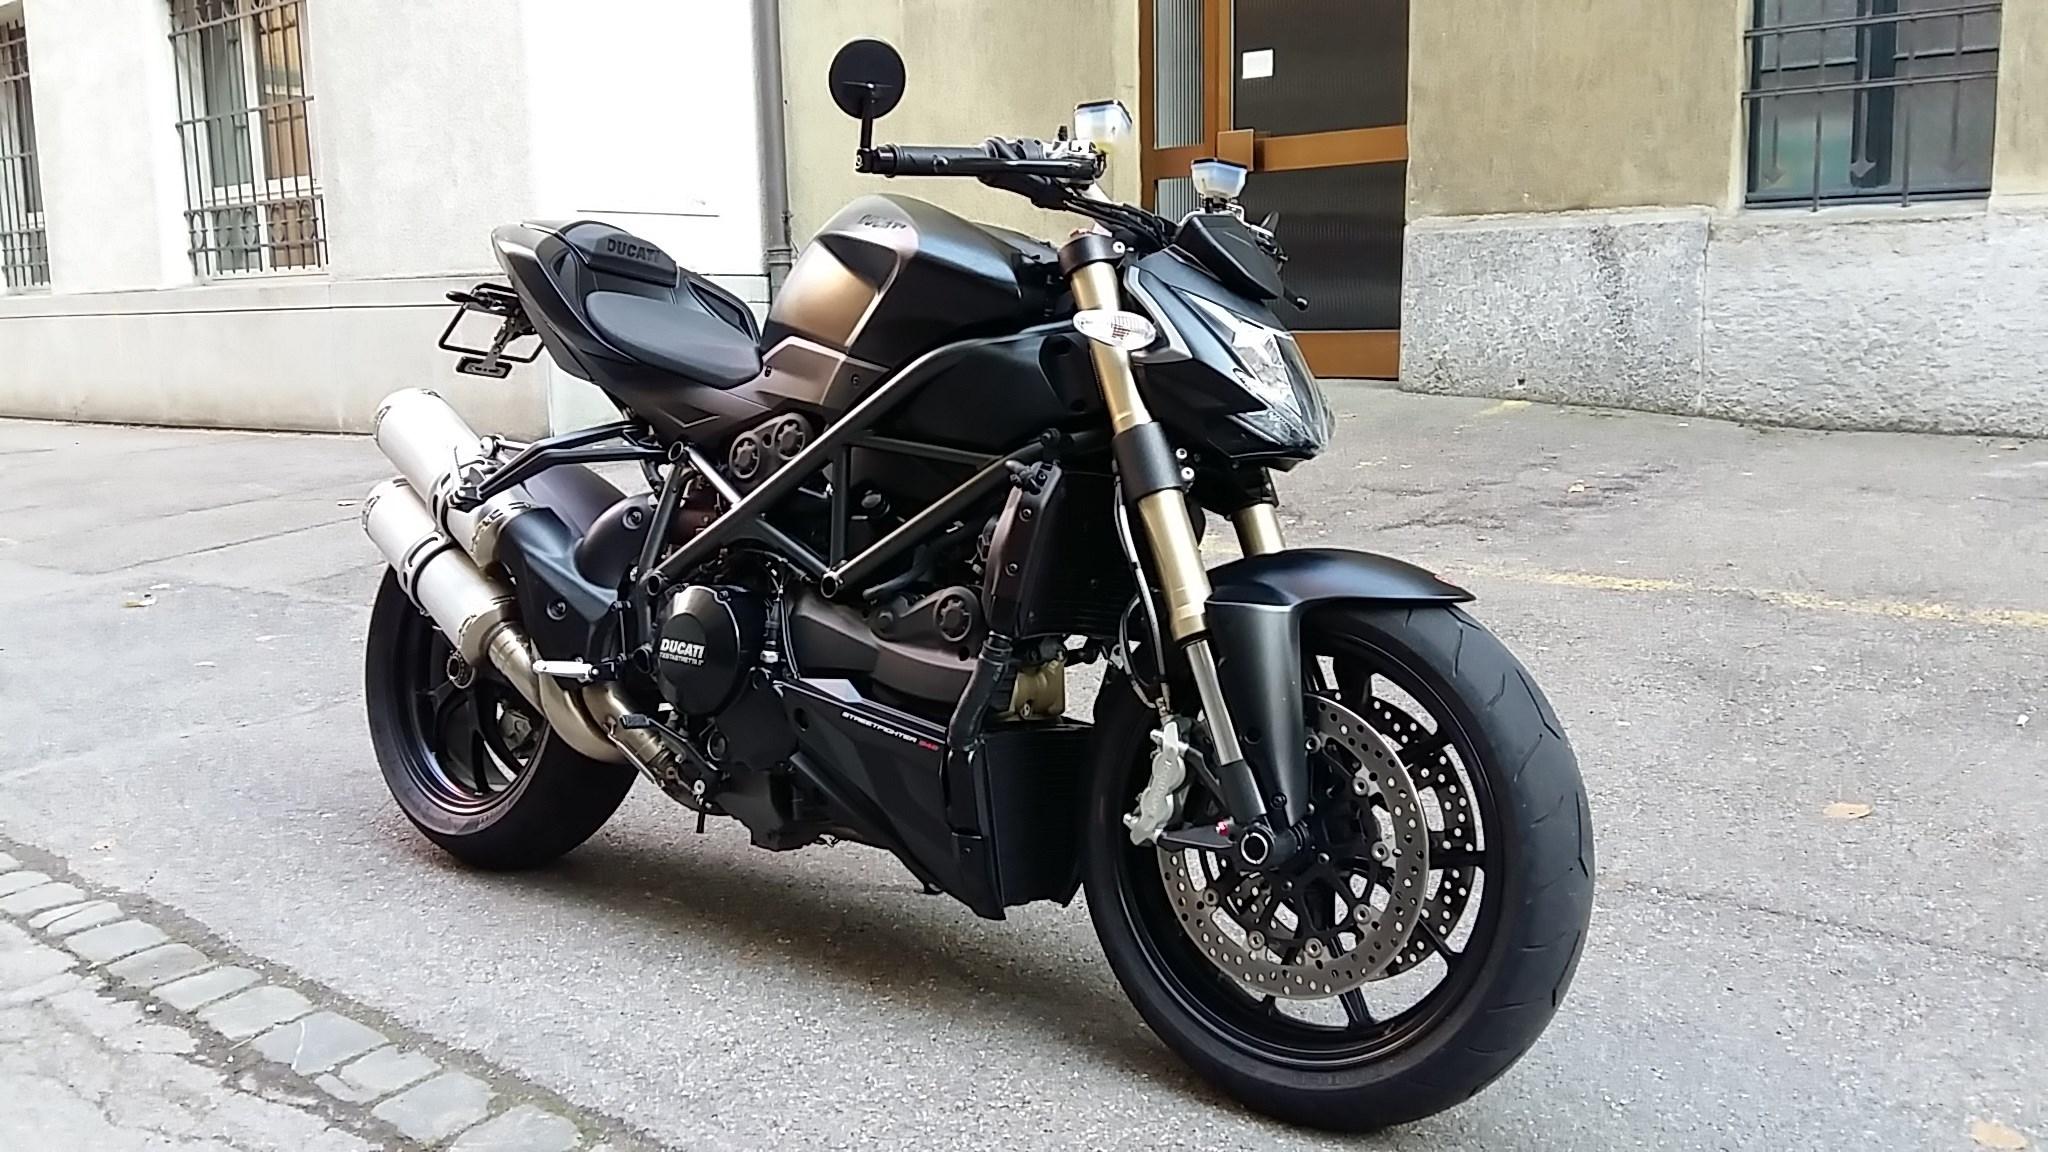 Ducati 848 Streetfighter